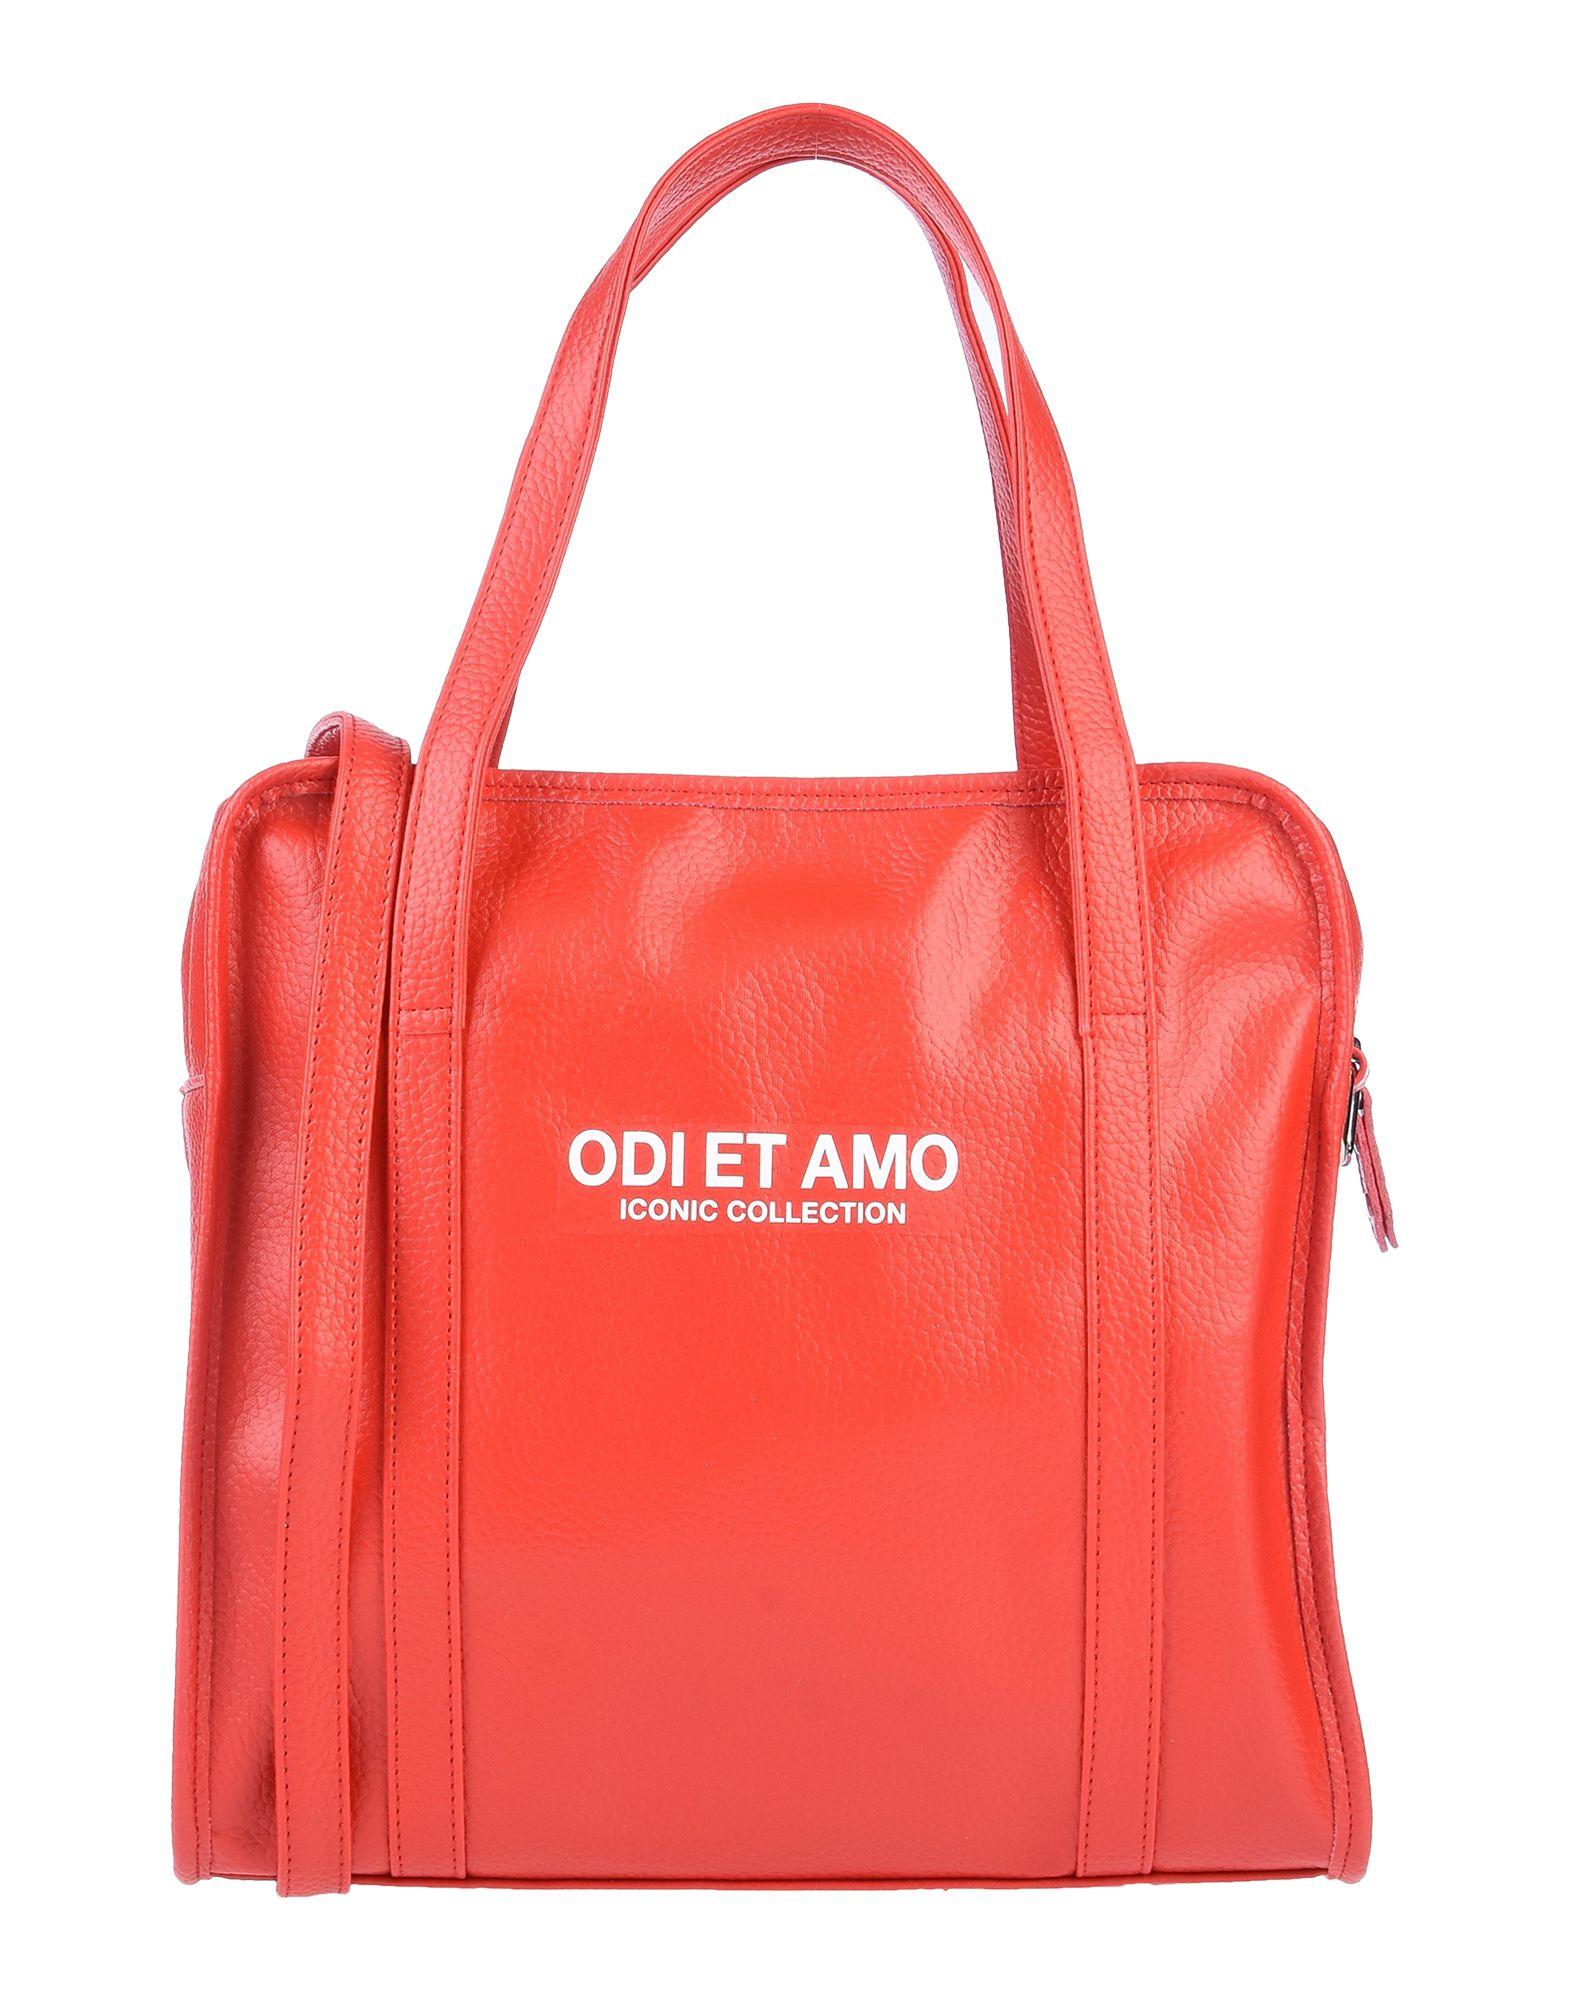 ODI ET AMO Сумка на руку сумка хобо amo la vita jk 92bwc 005 искусственная кожа